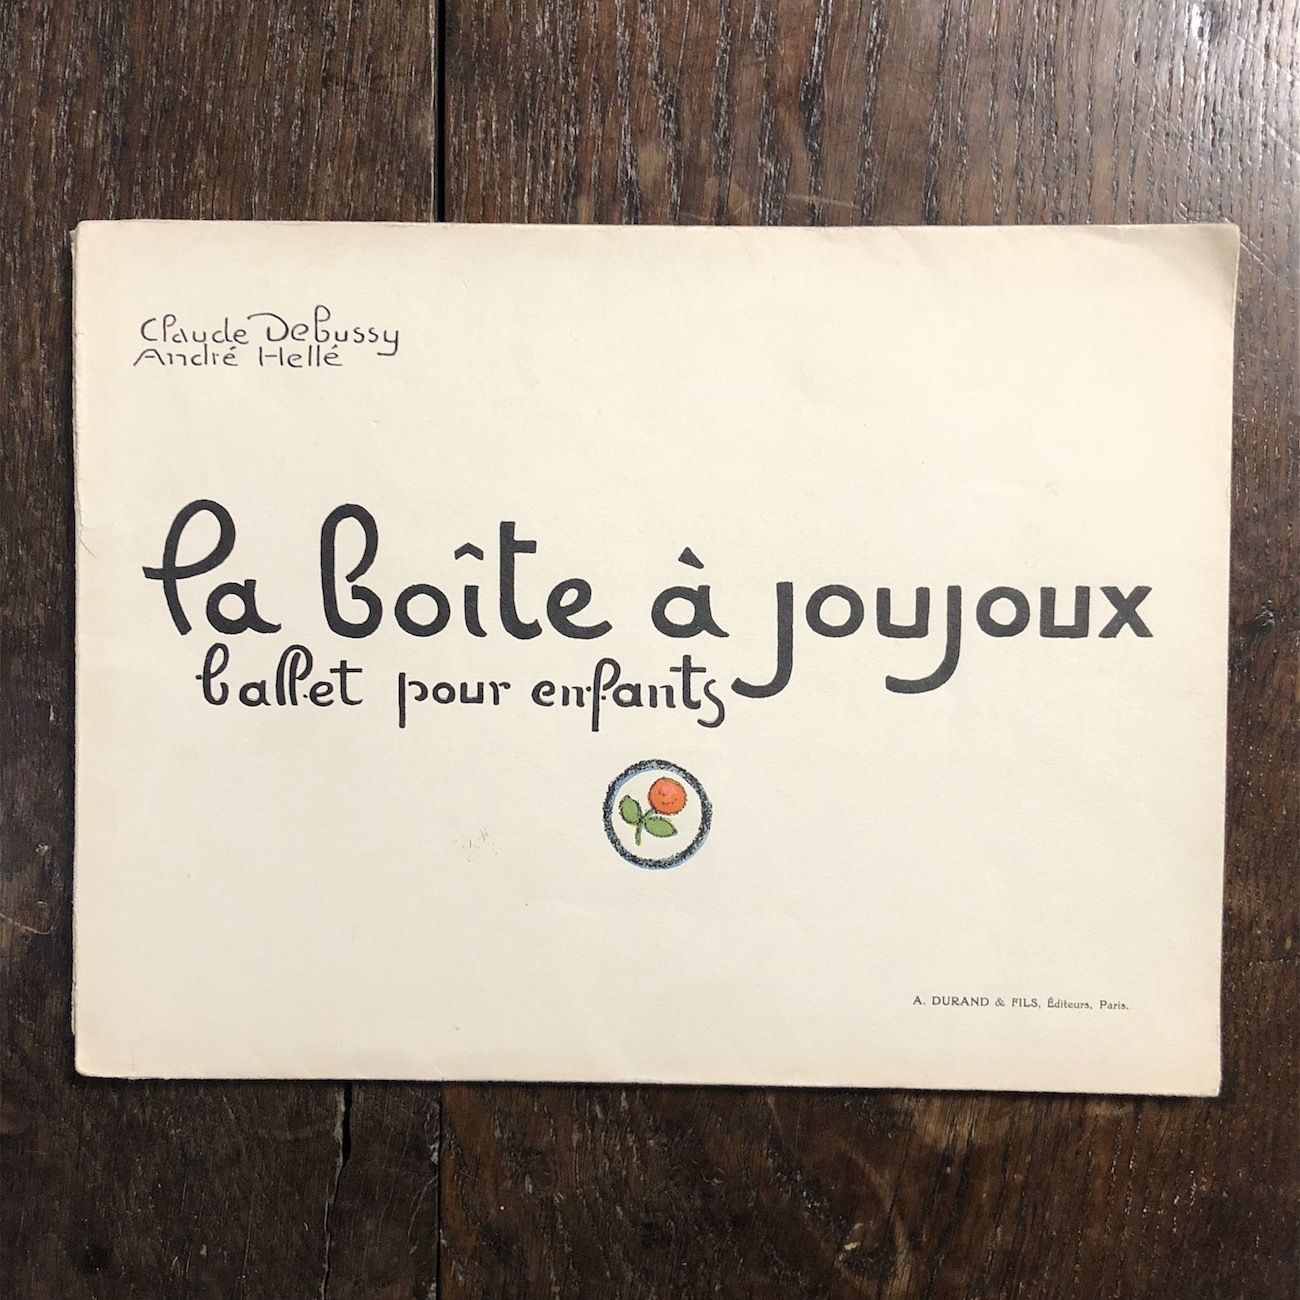 「La boite a joujoux(リトグラフ刷)」Claude Debussy(クロード・ドビュッシー) Andre Helle(アンドレ・エレ)